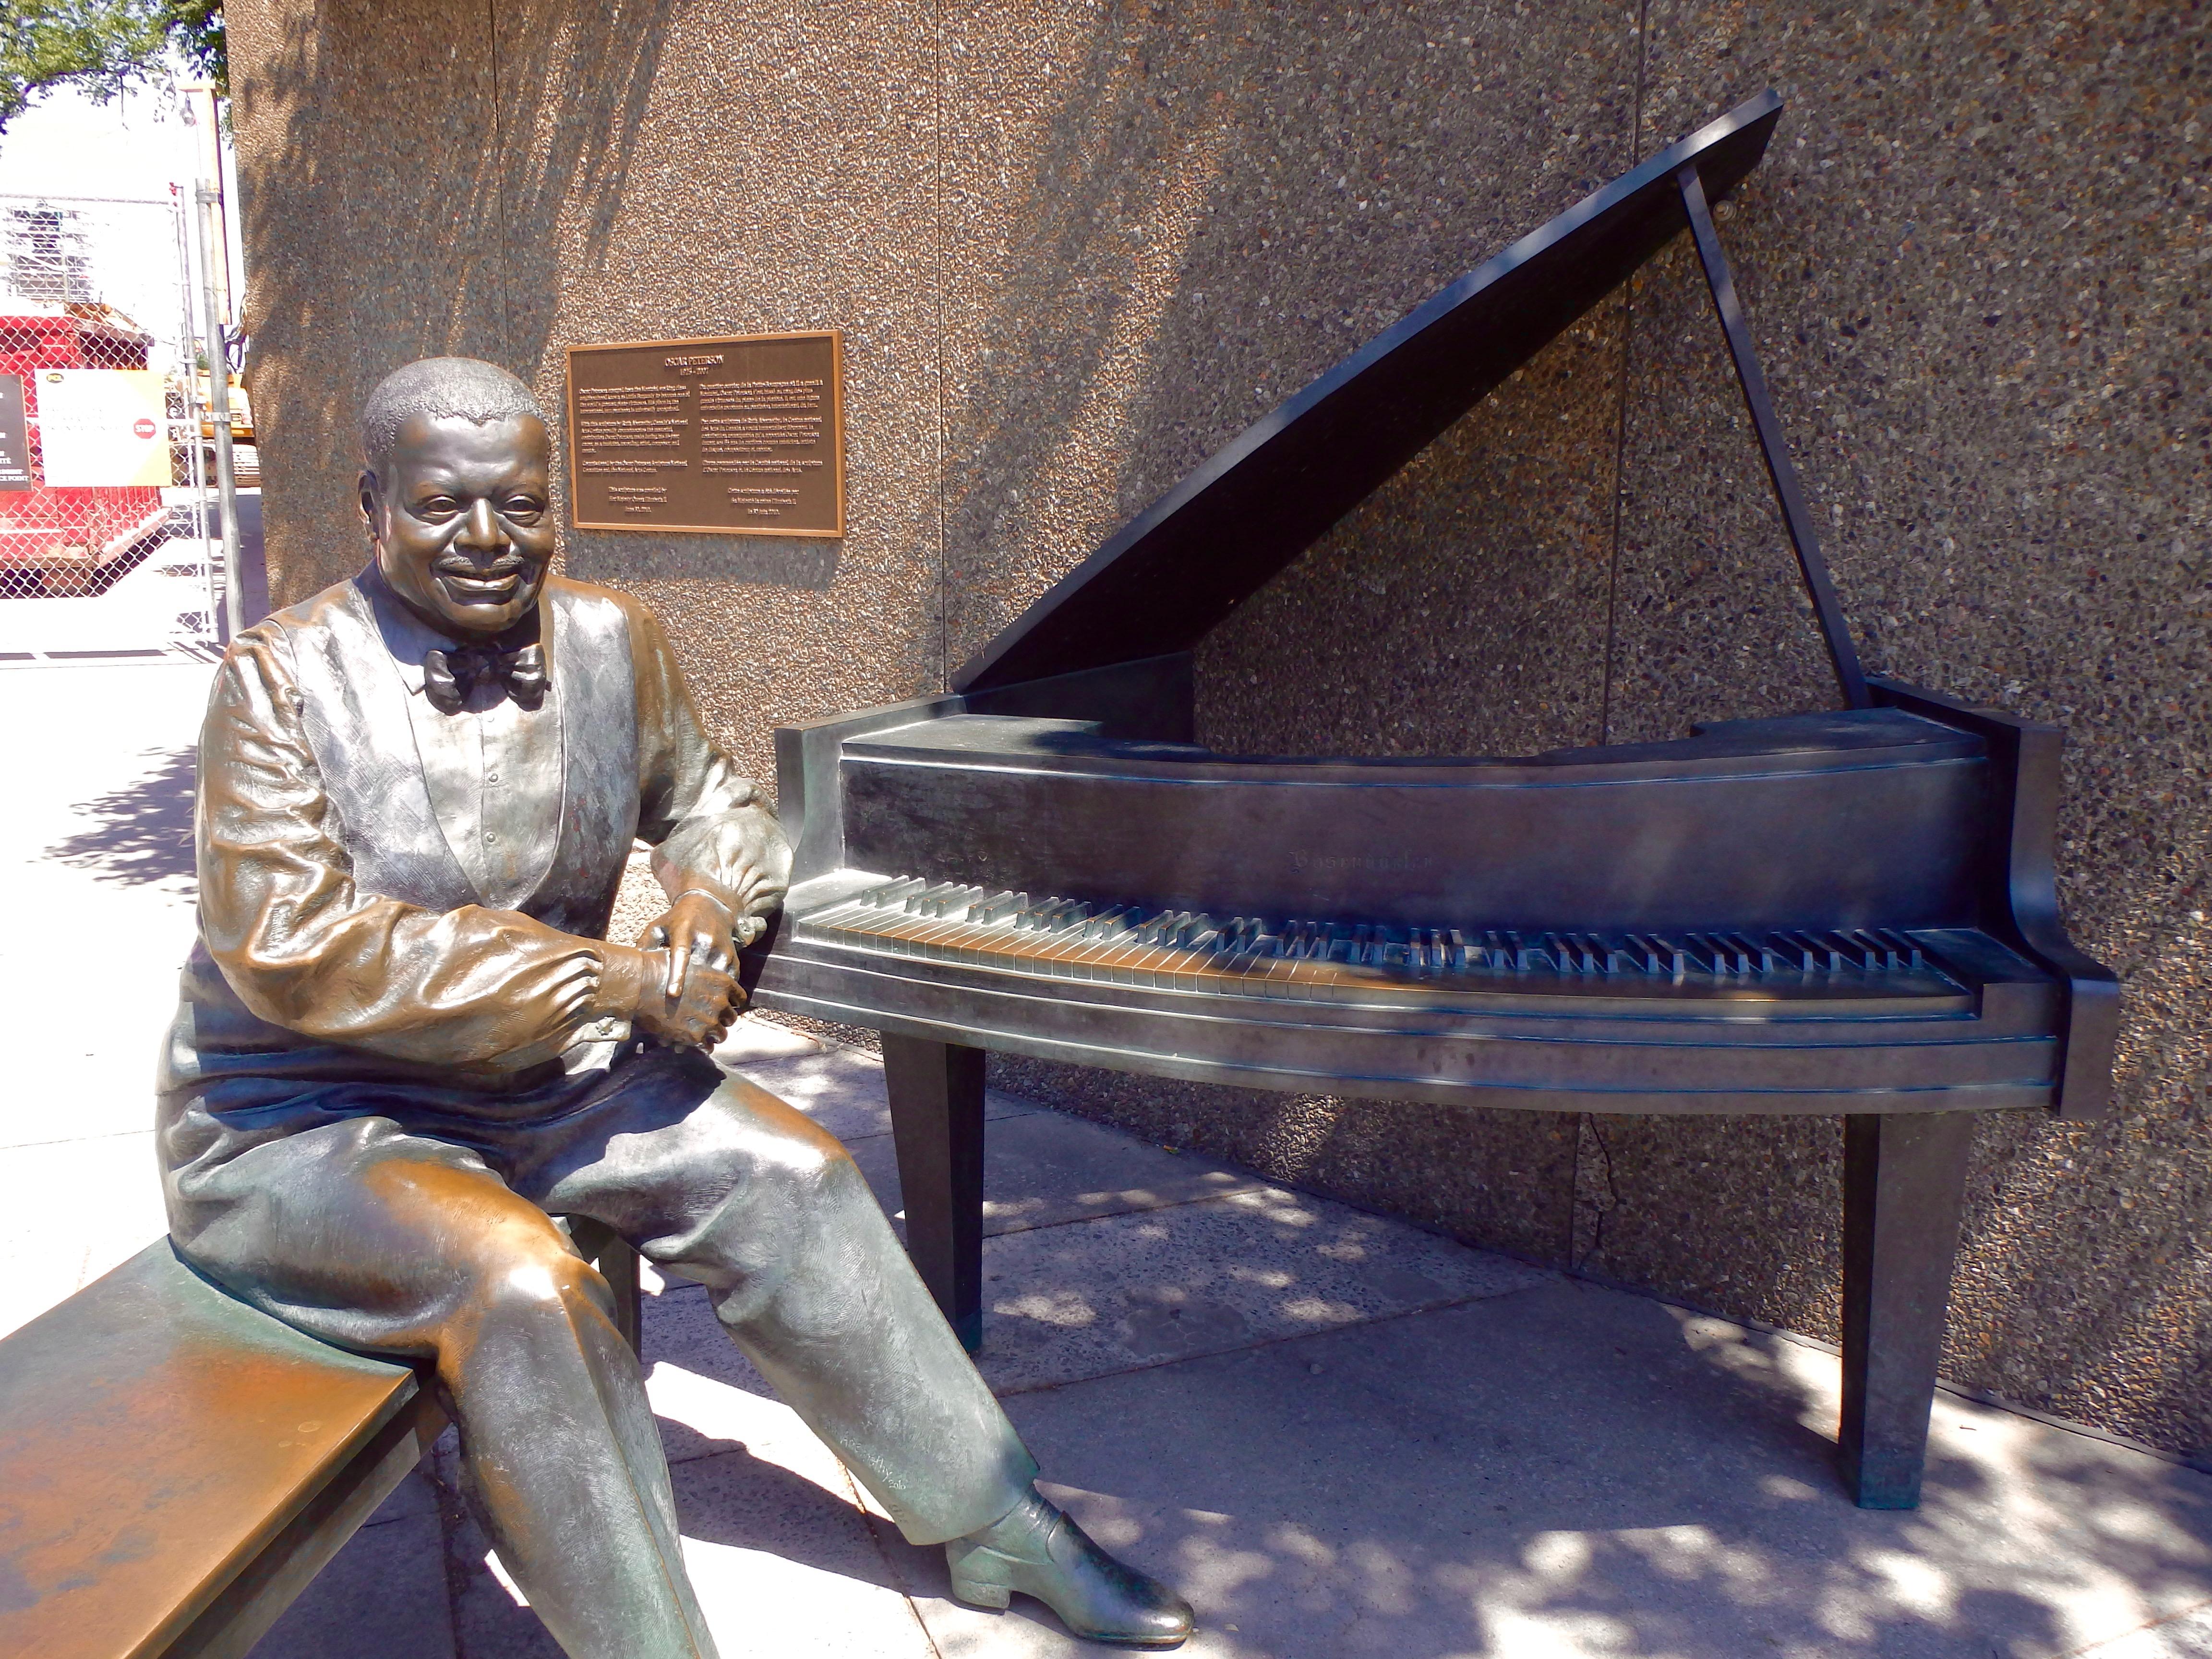 piano man statue ottawa oscar peterson public art in ottawa